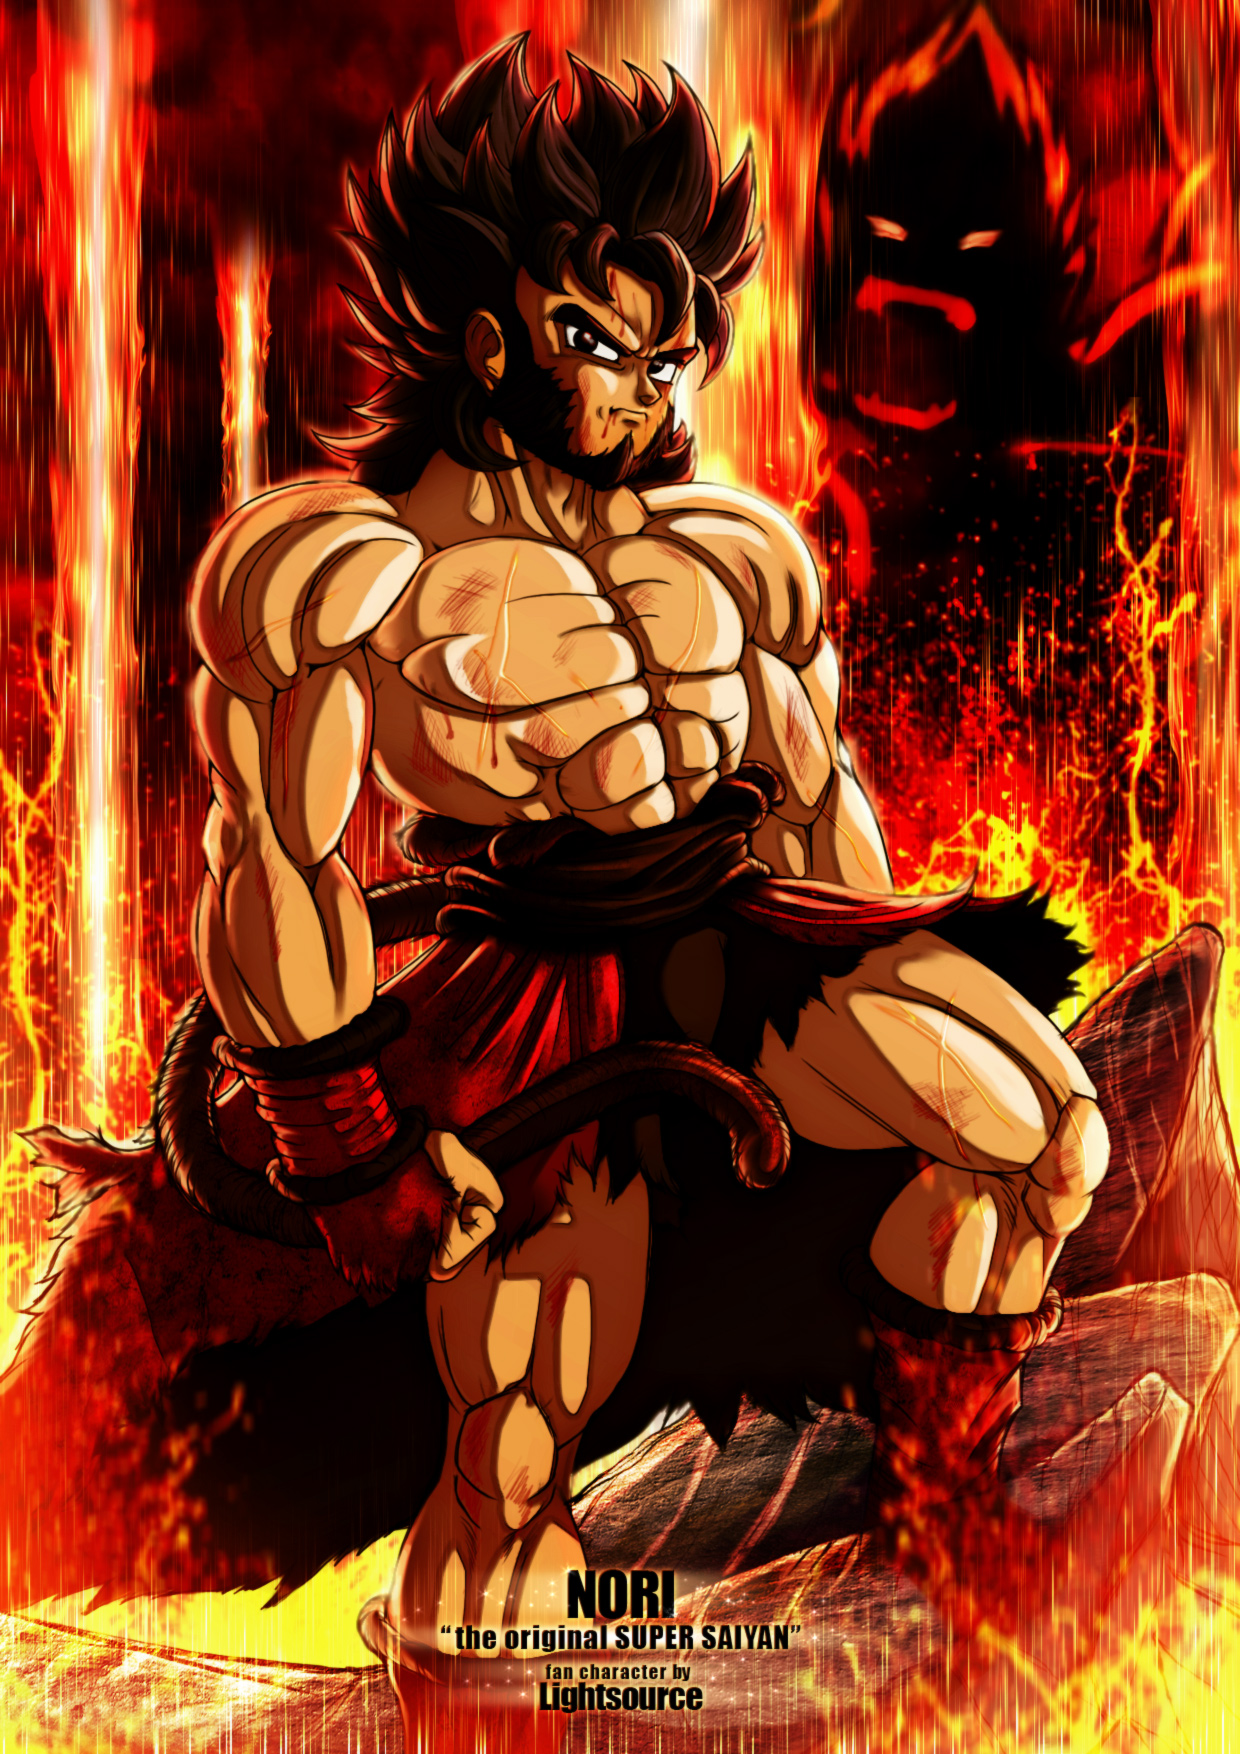 Nori the original Super Saiyan -fan character by xXLightsourceXx